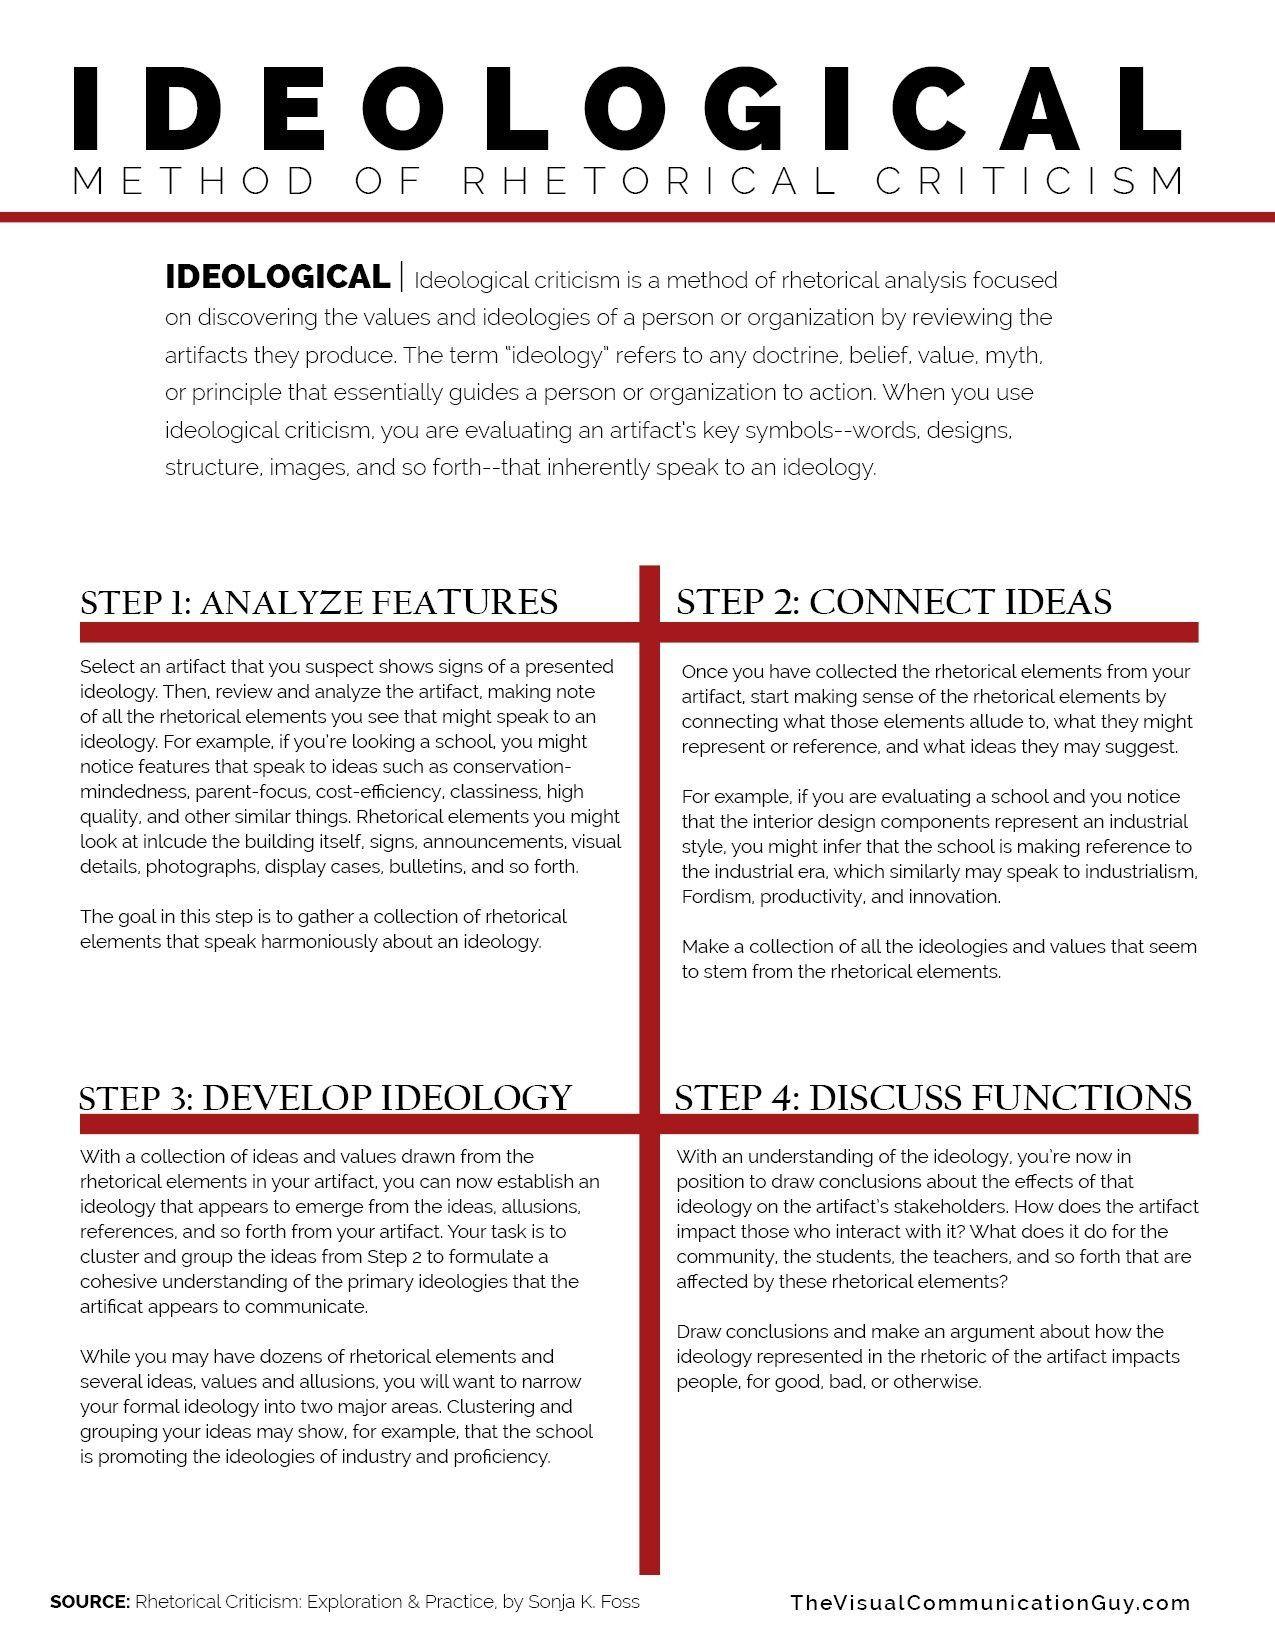 20 Ethos Pathos Logos Worksheet Answers In